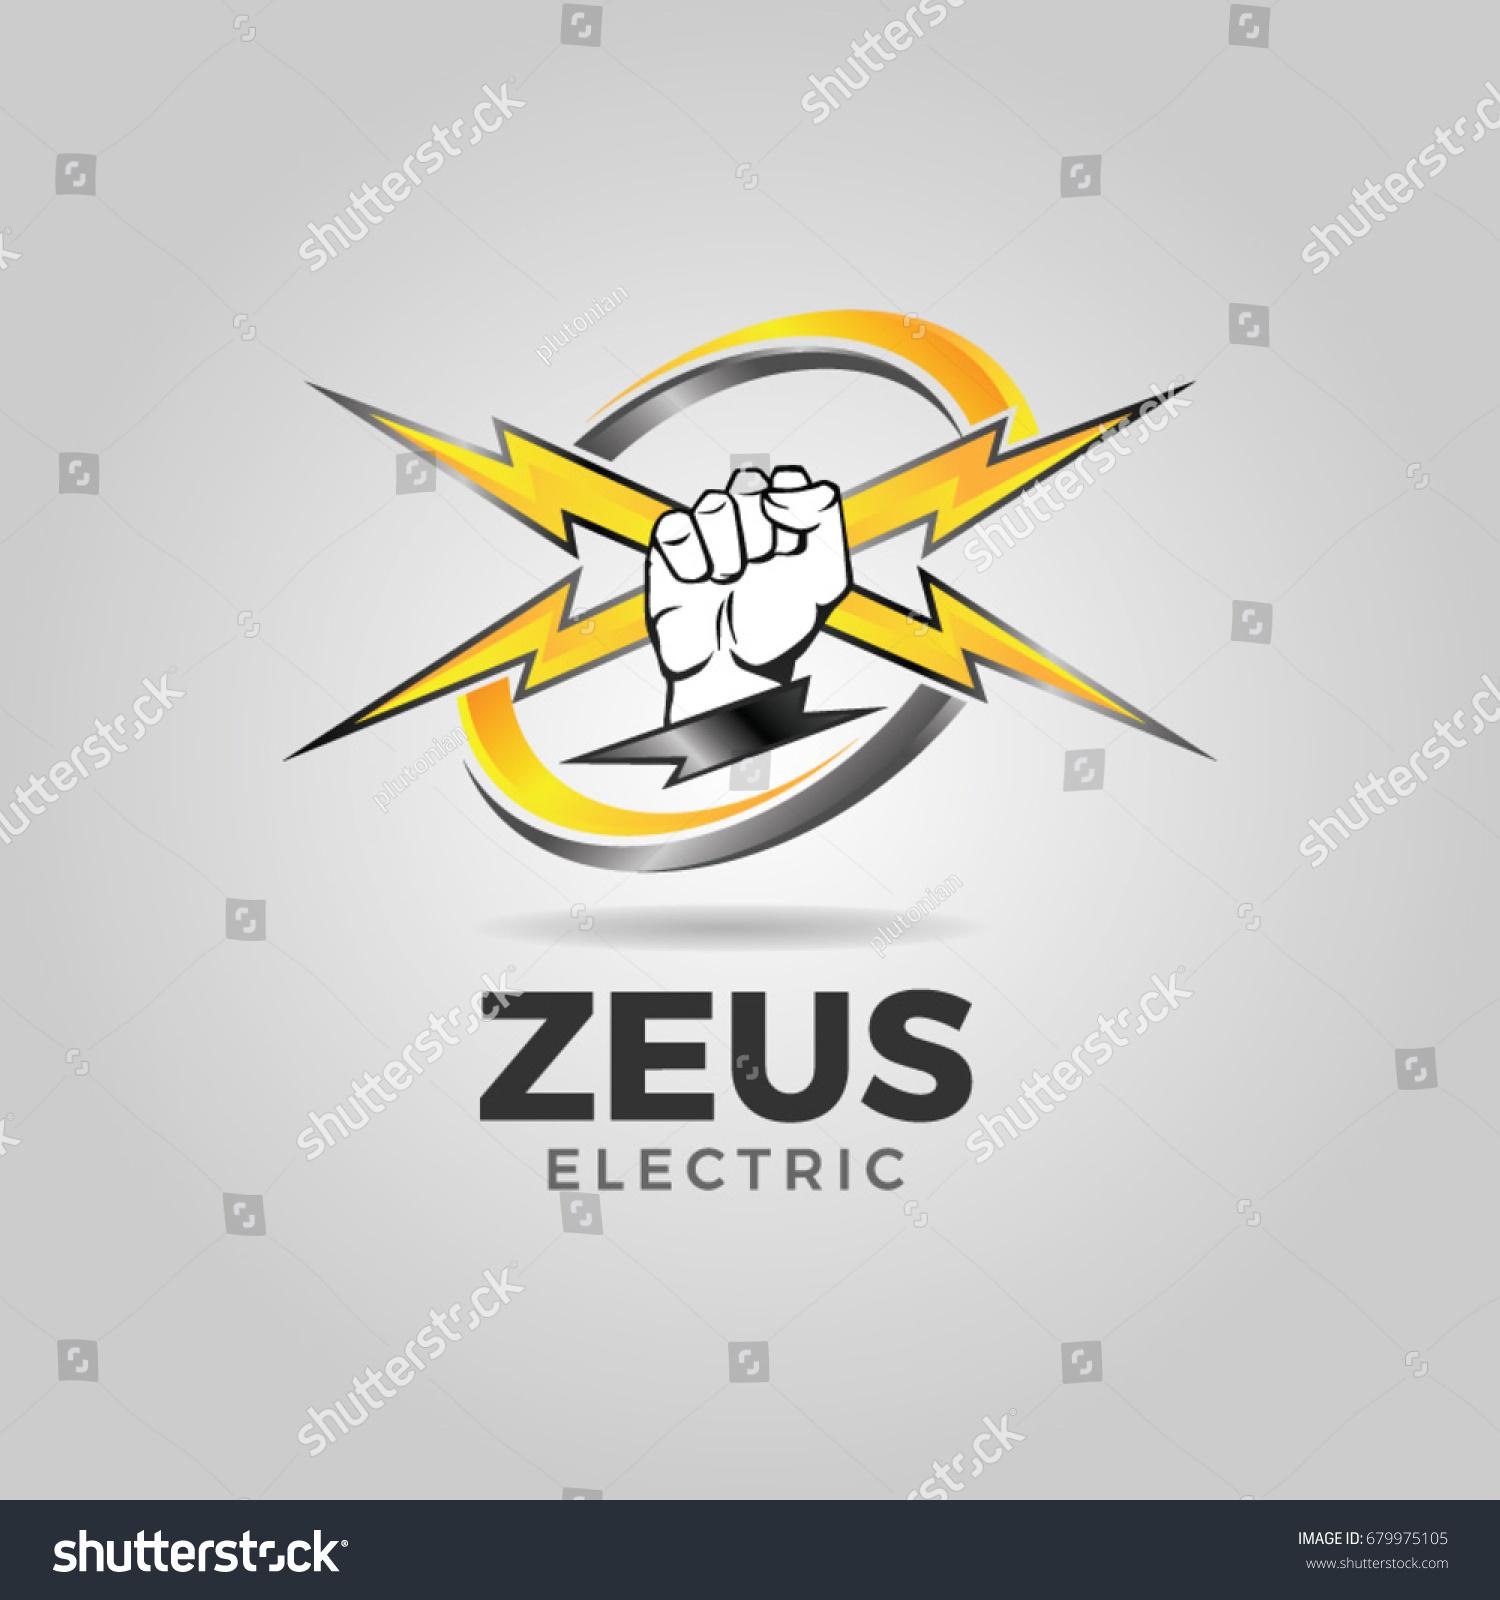 Zeus electric service consultant logo icon stock vector 679975105 zeus electric service consultant logo icon symbol biocorpaavc Images